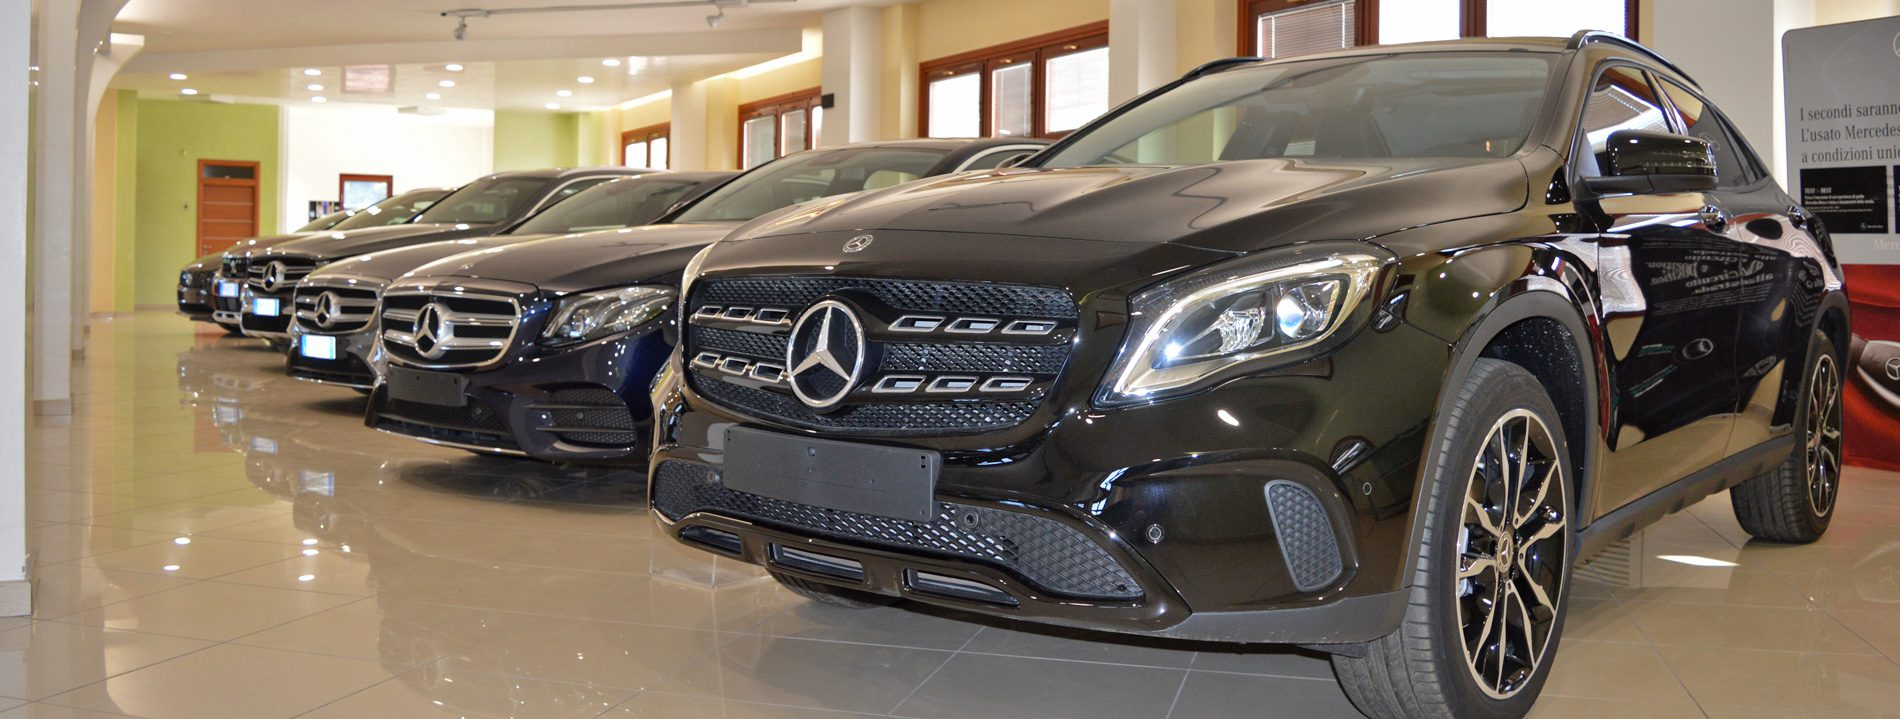 Automobili Di.Pa. Lucera (FG)